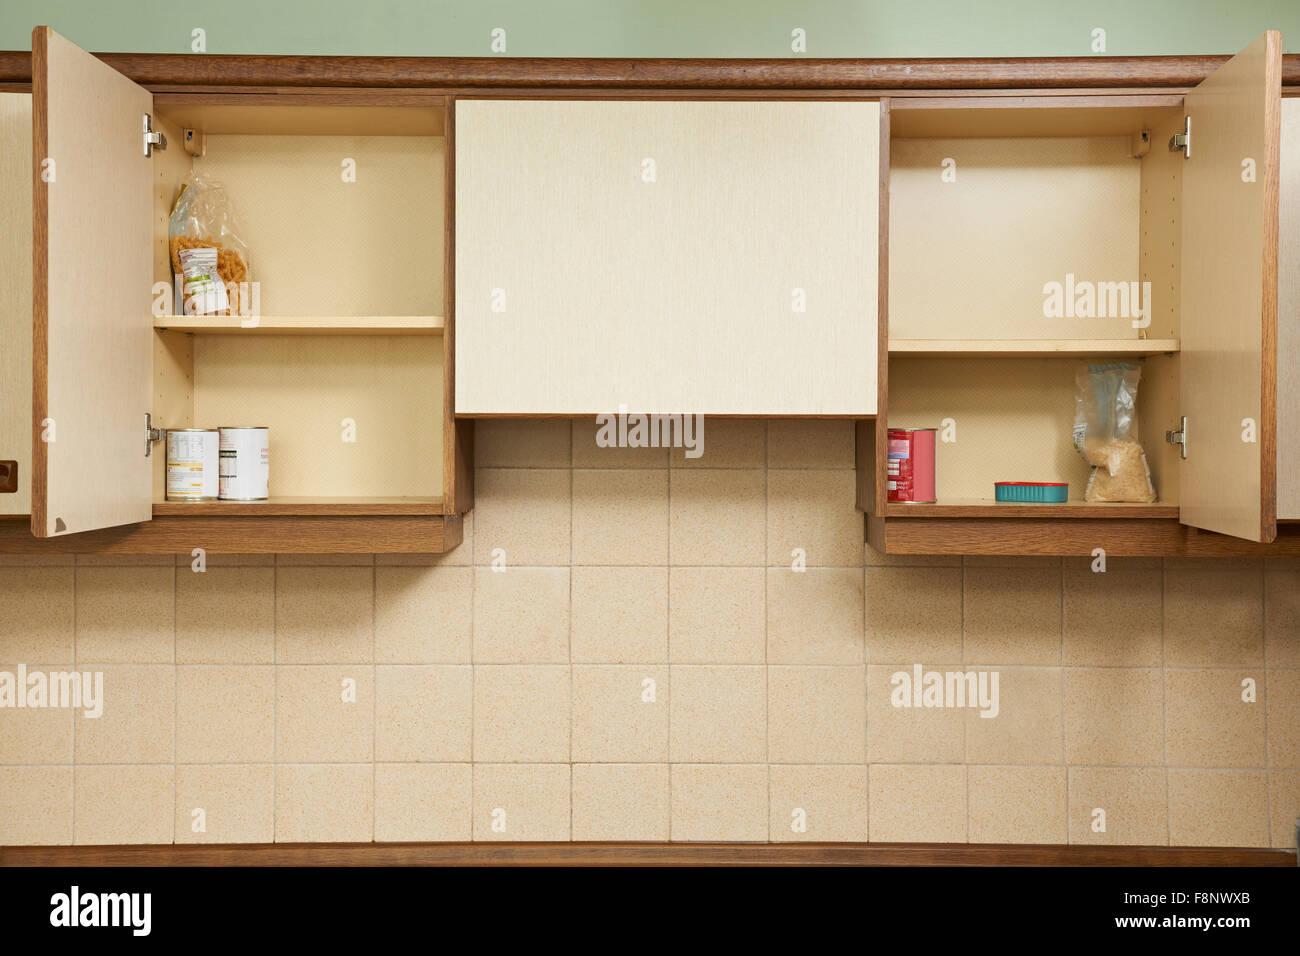 Svuotare Mobili Da Cucina Foto Immagine Stock 91450419 Alamy